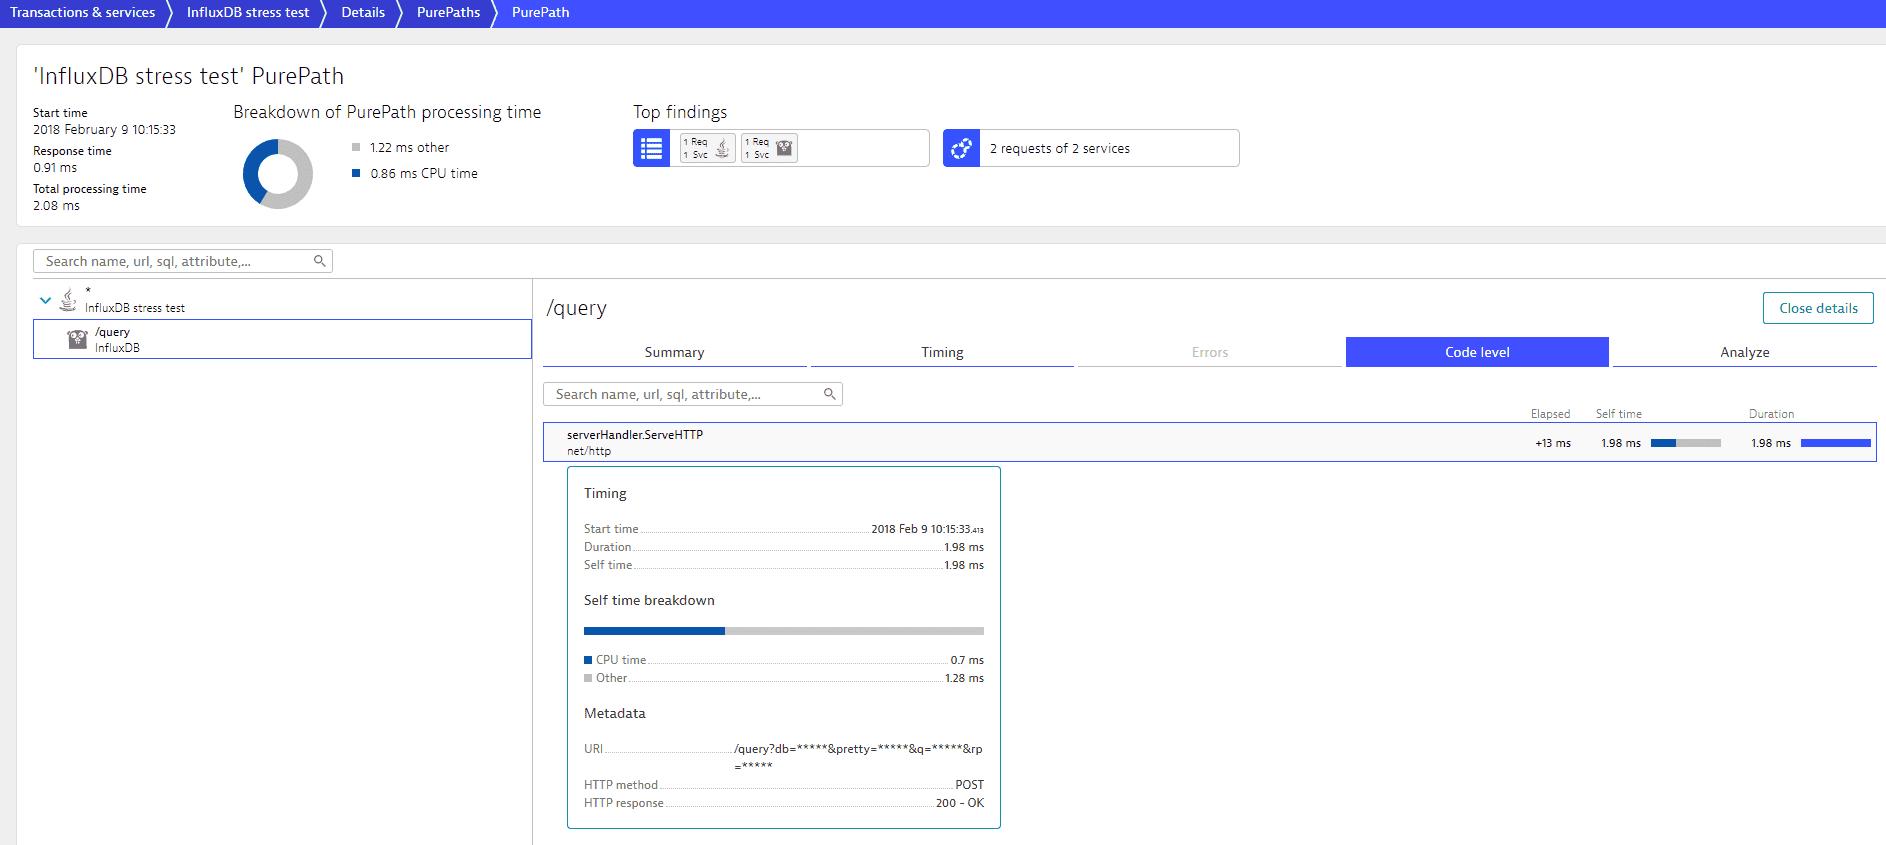 PurePath - code level